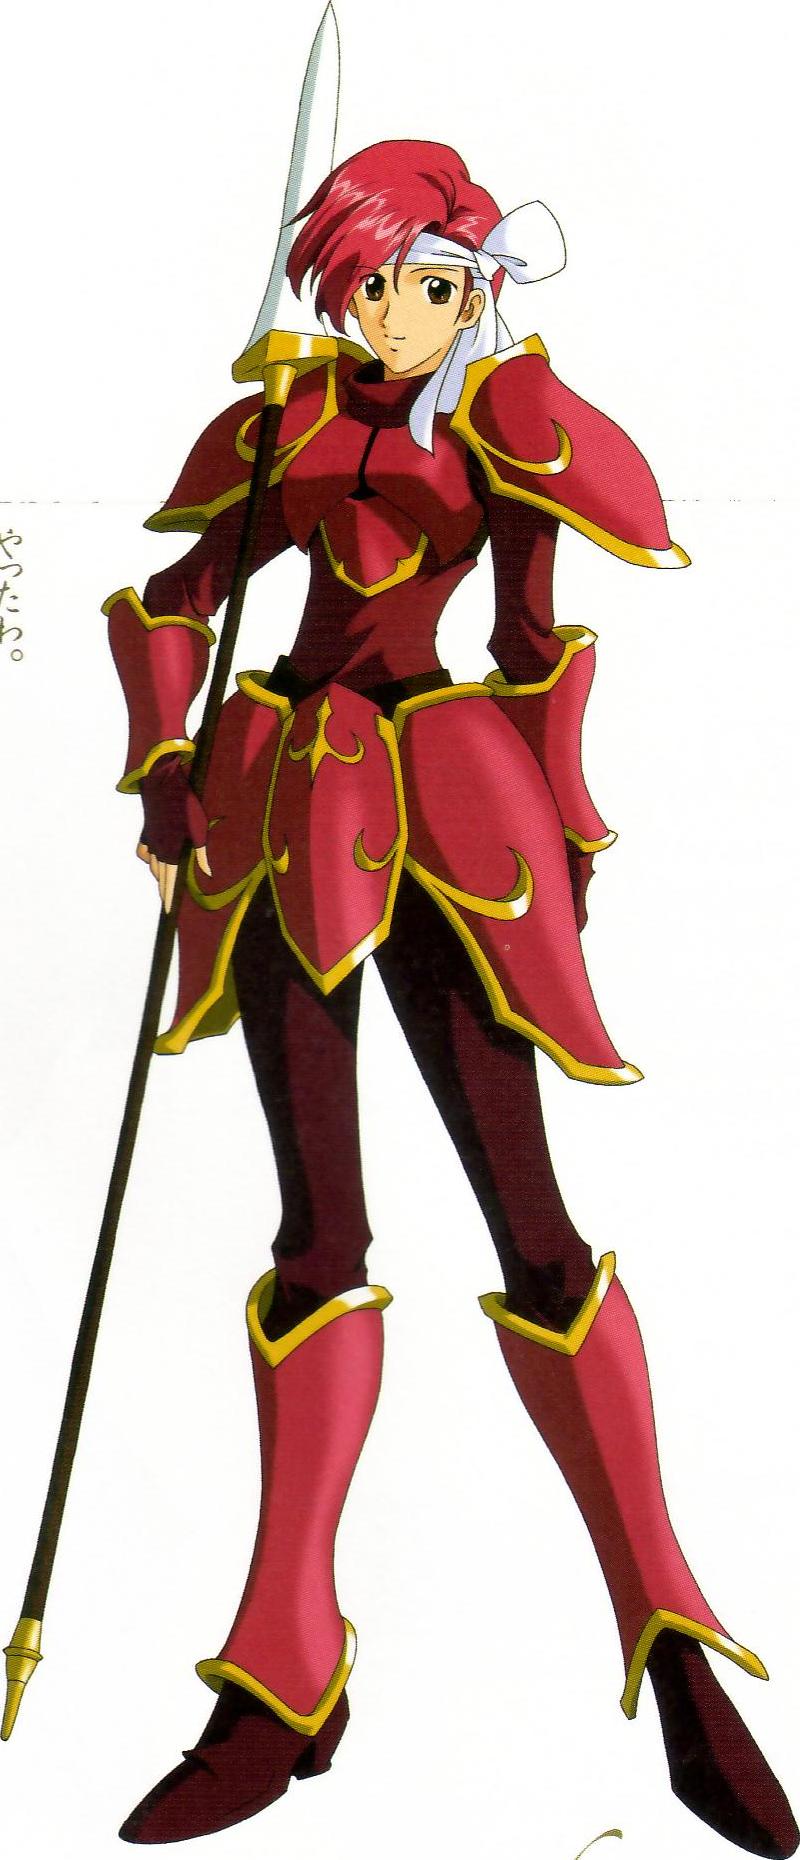 Cecil (Fire Emblem)